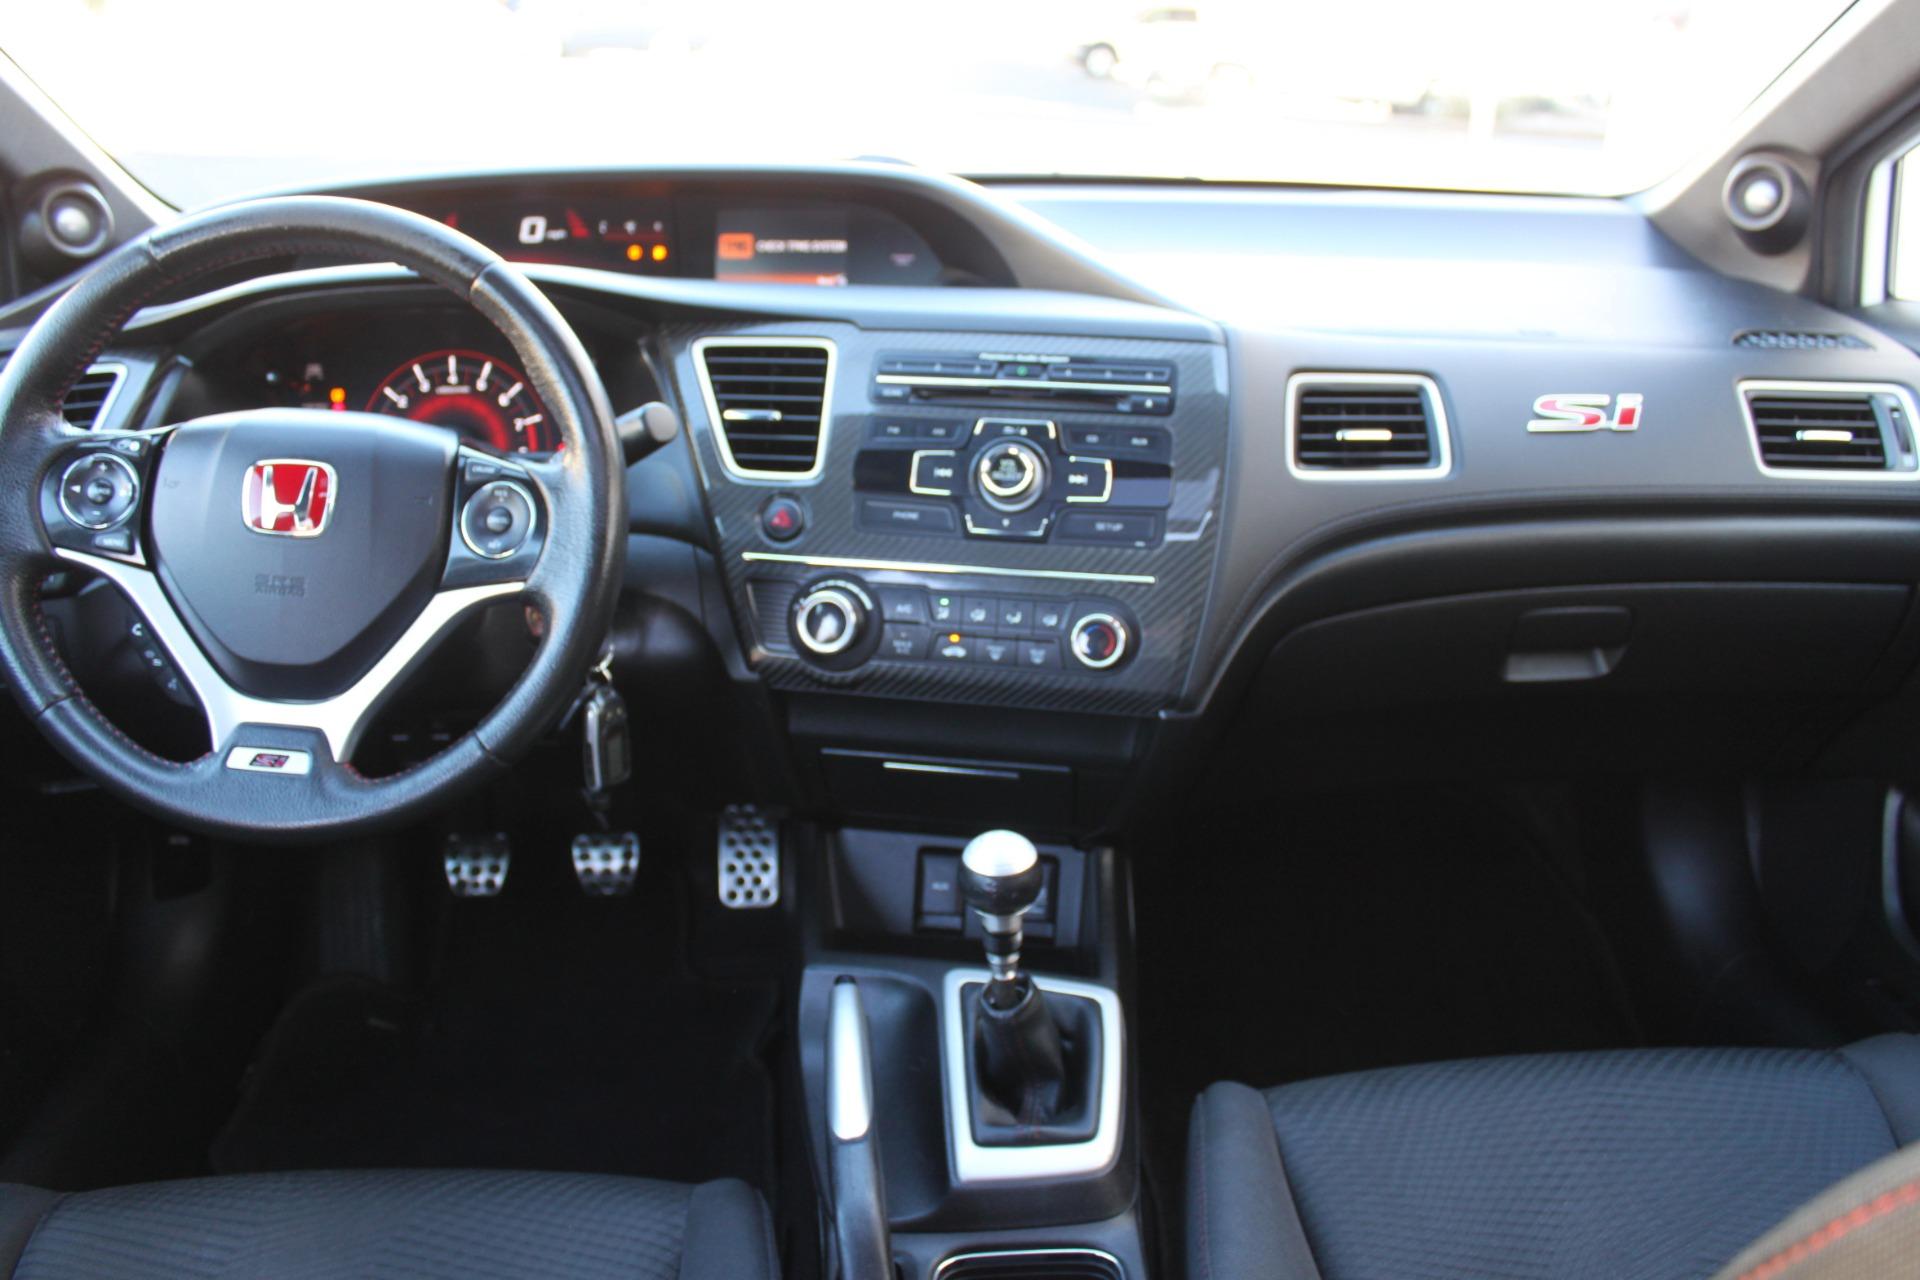 Used-2013-Honda-Civic-Sedan-Si-BMW